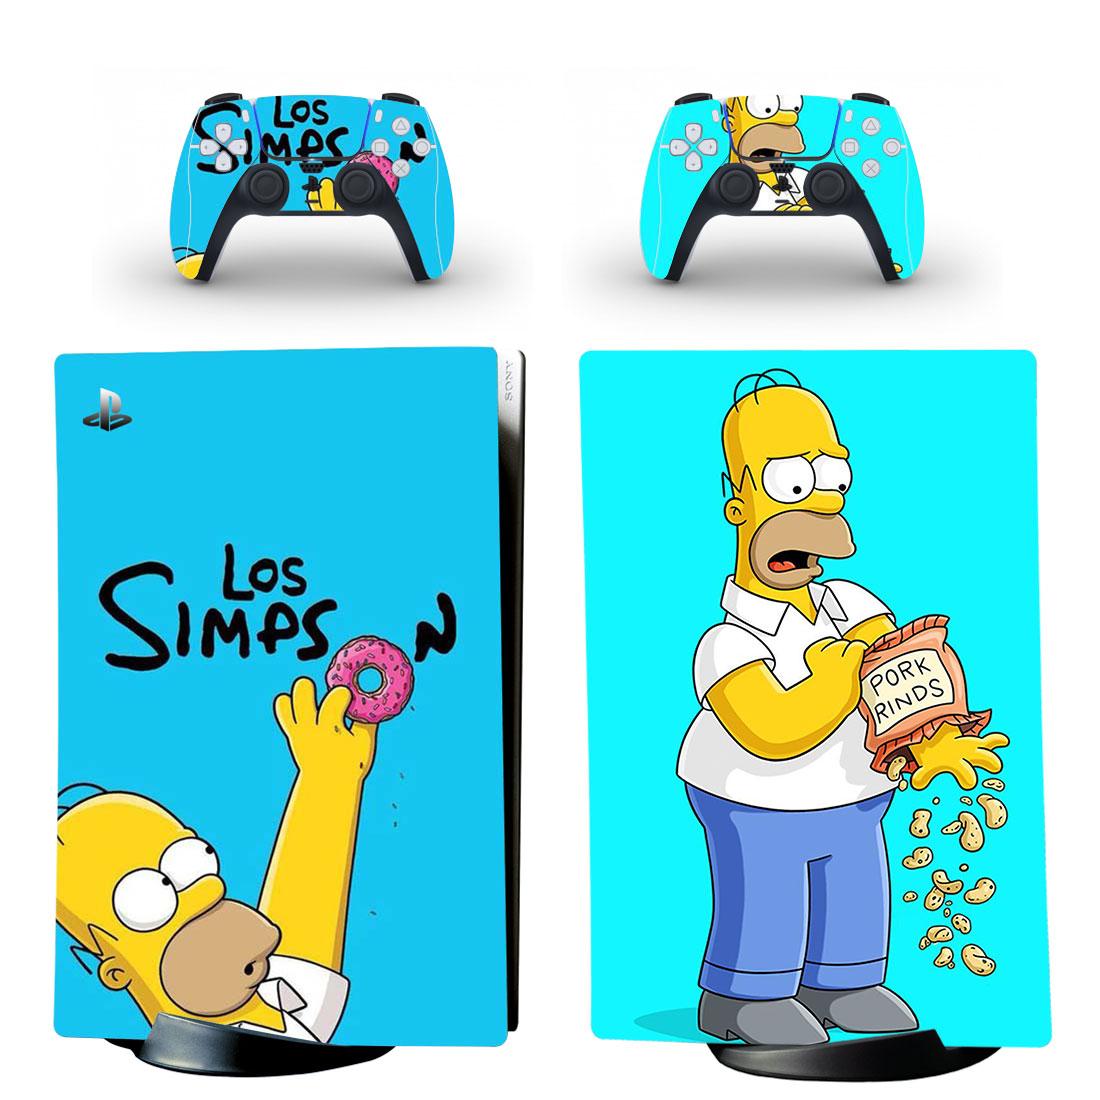 Los Simpson PS5 Digital Edition Skin Sticker Decal